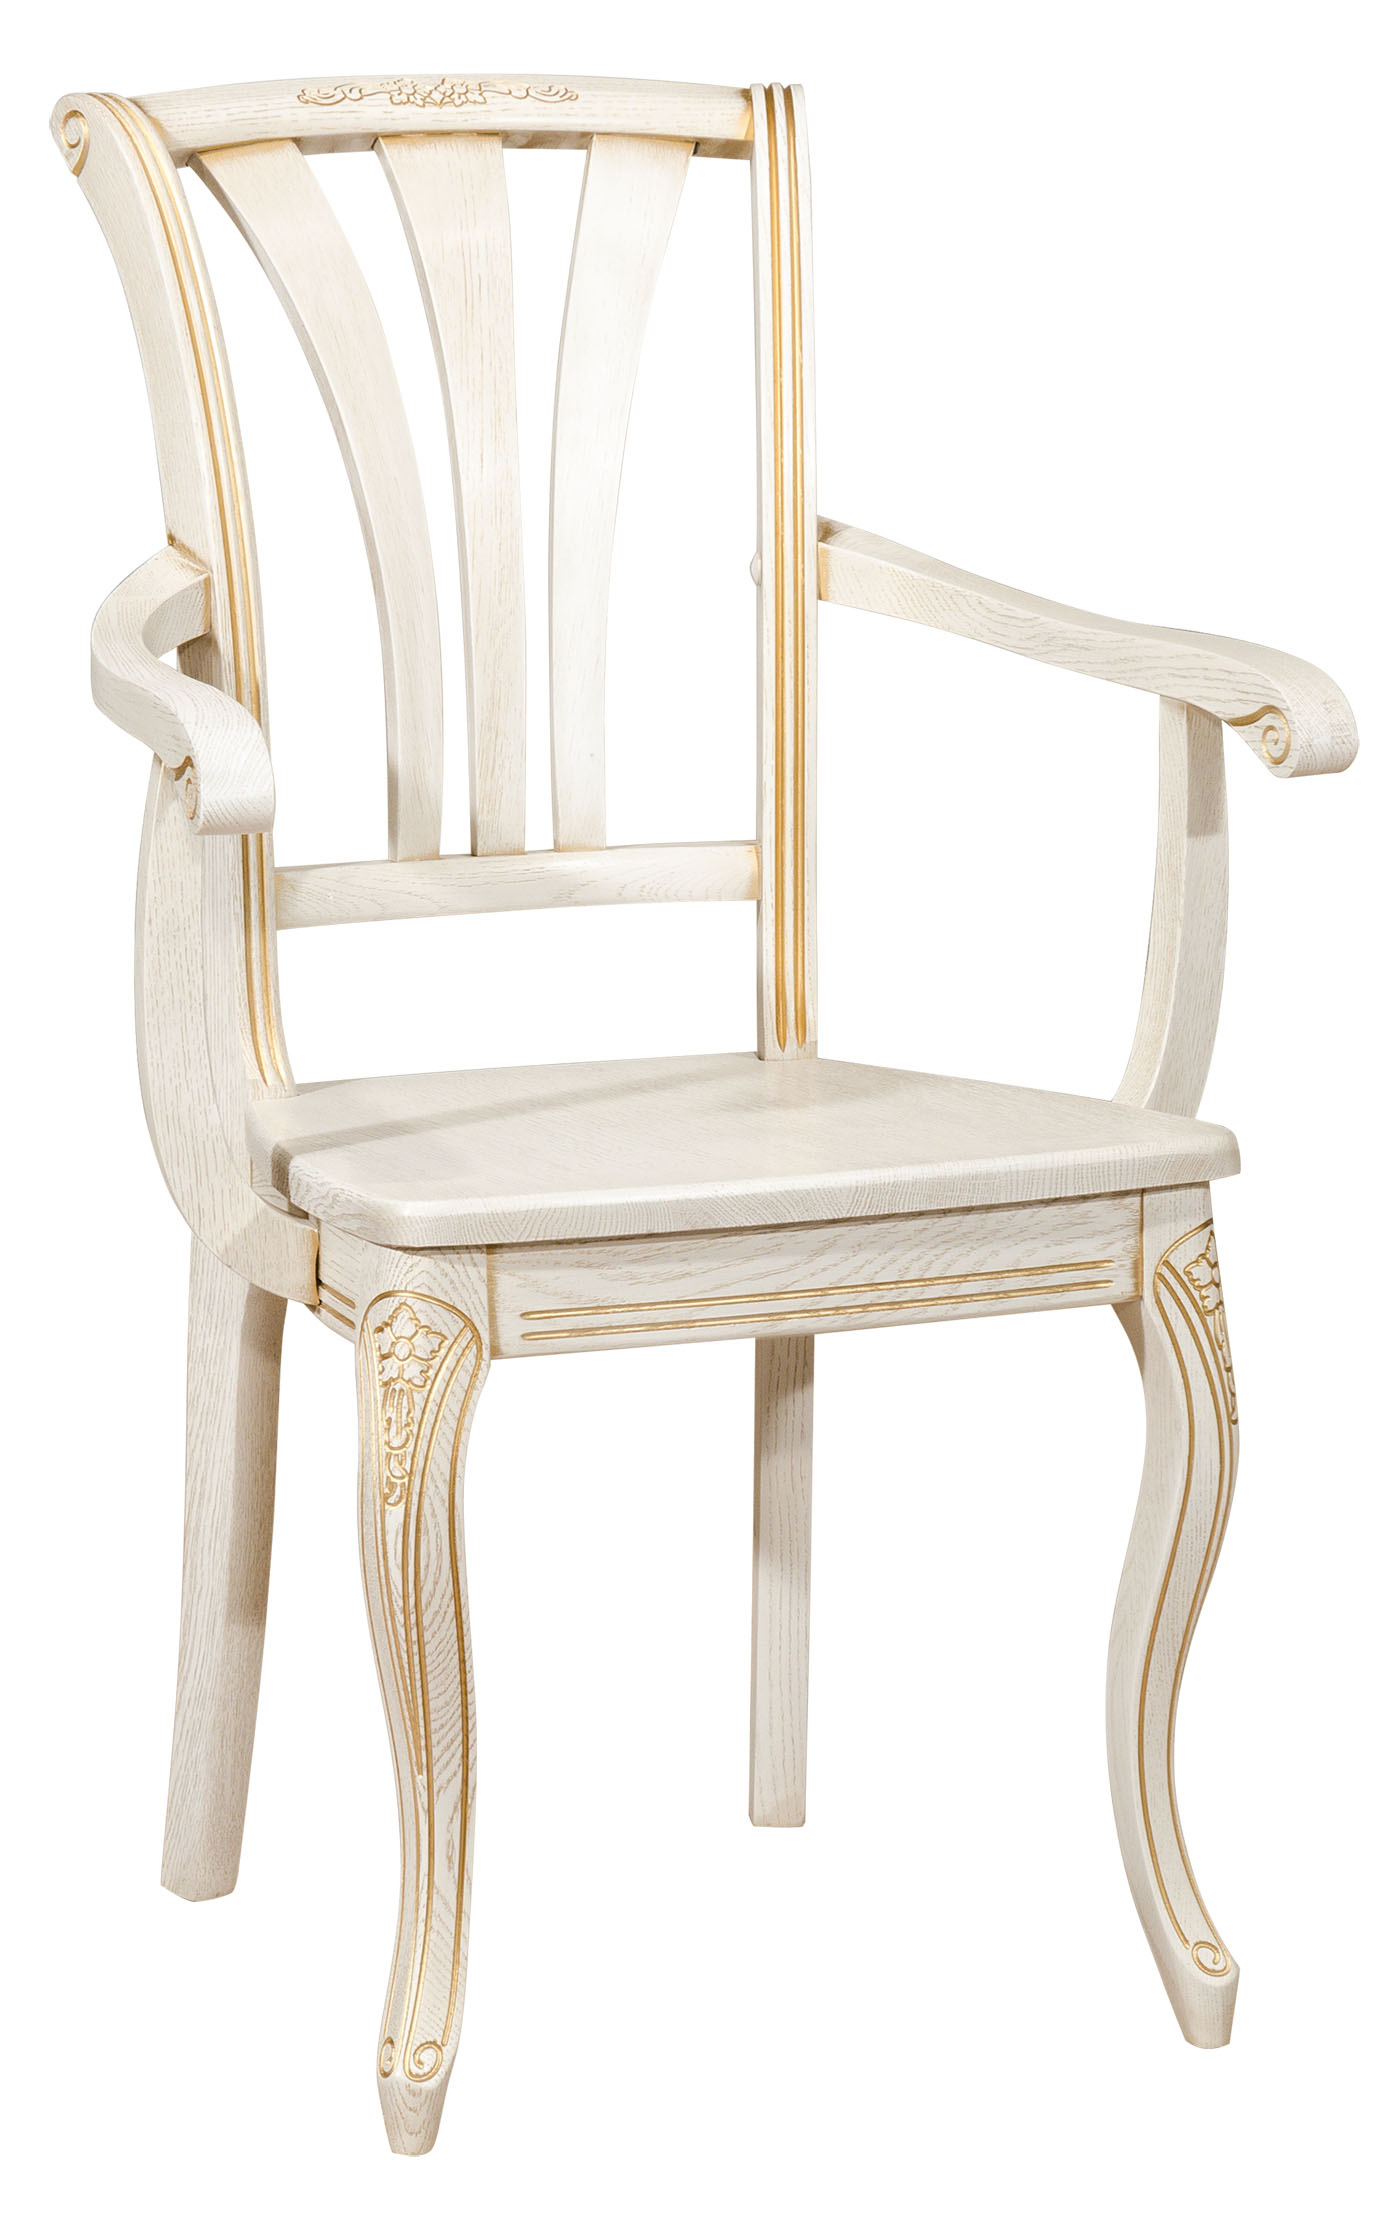 стул (Кресло) Марсель-2 жесткий